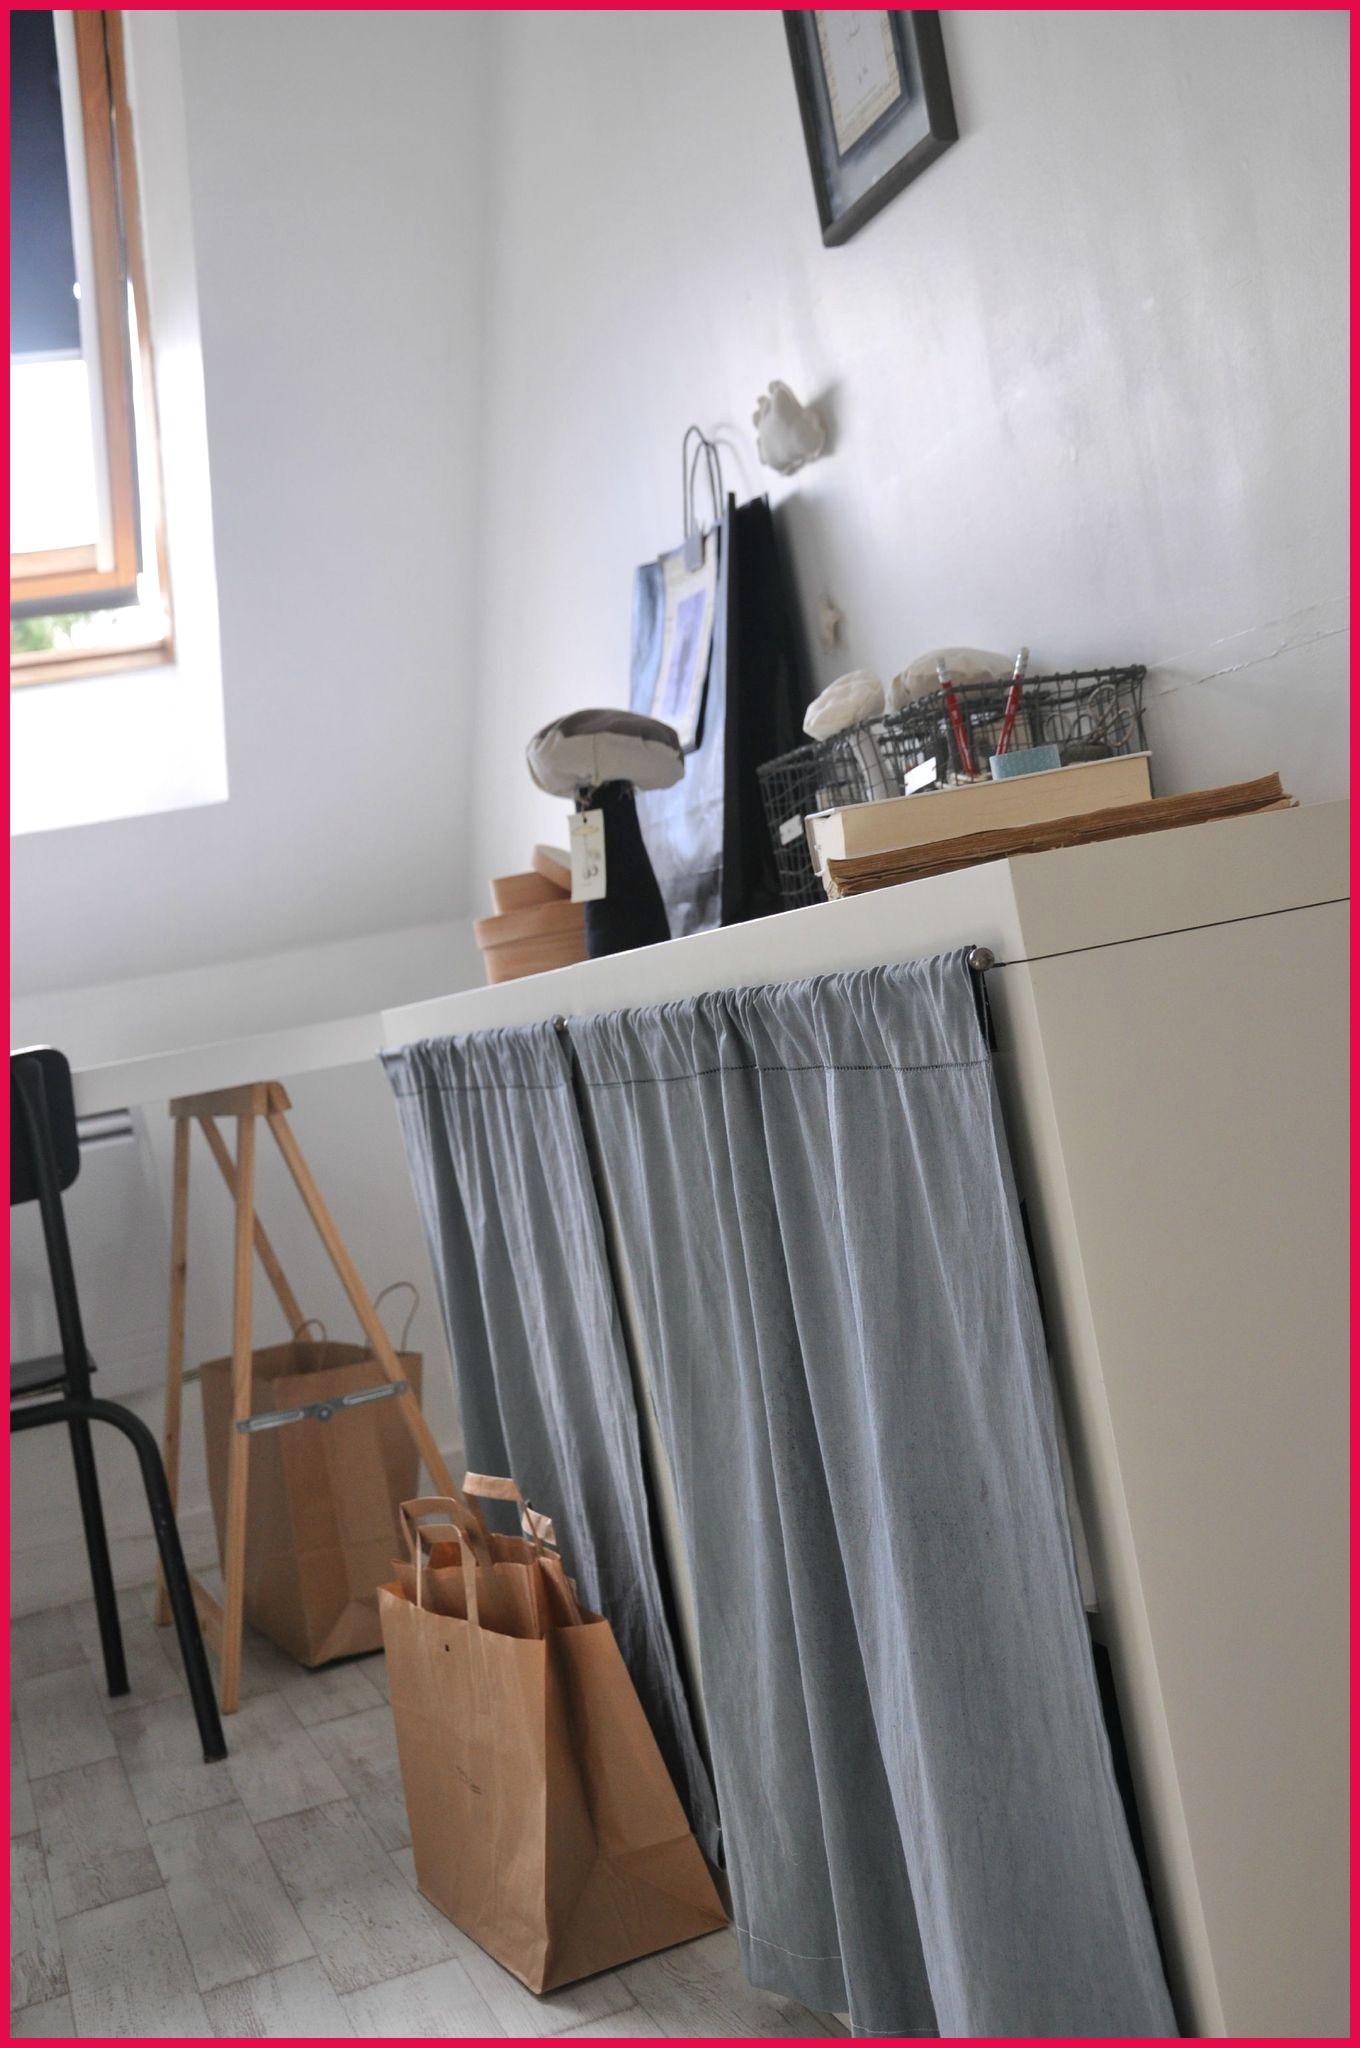 meuble cuisine fermeture rideau